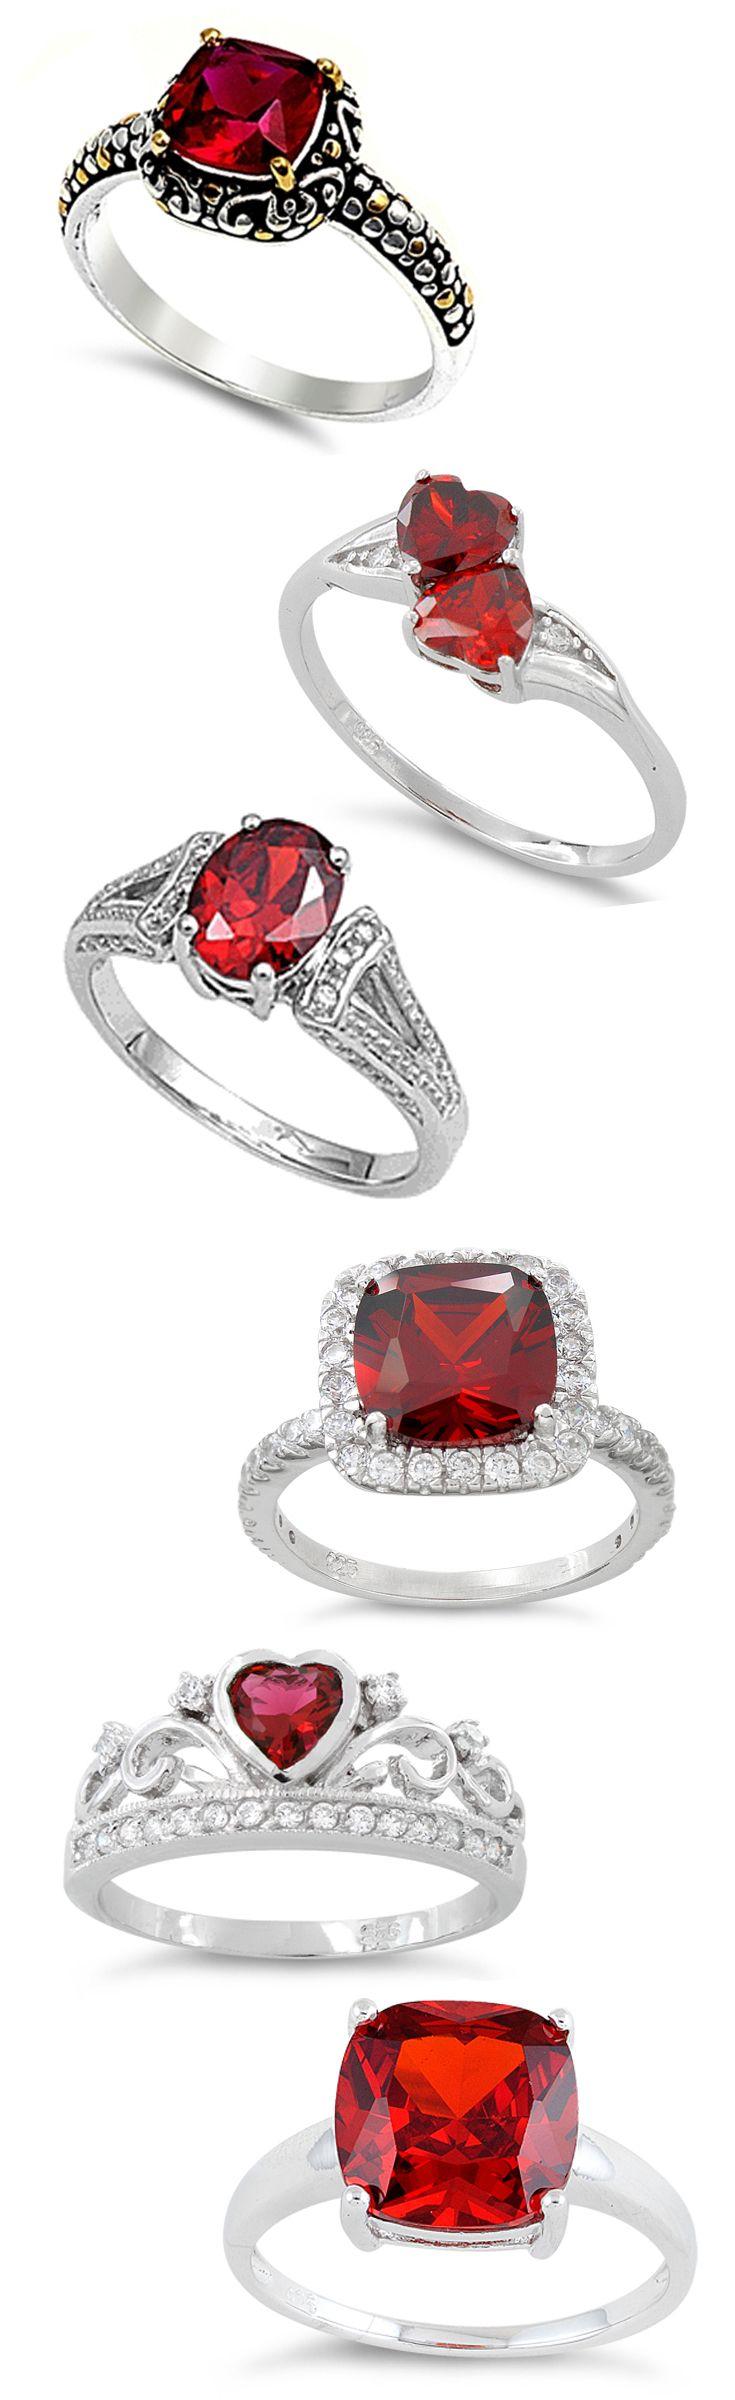 Engagement Ring Wedding Ring RG-006 Garnet Ring Garnet Silver Ring Design N0 Red Stone Ring,January Birthstone Ring Birthday Gift